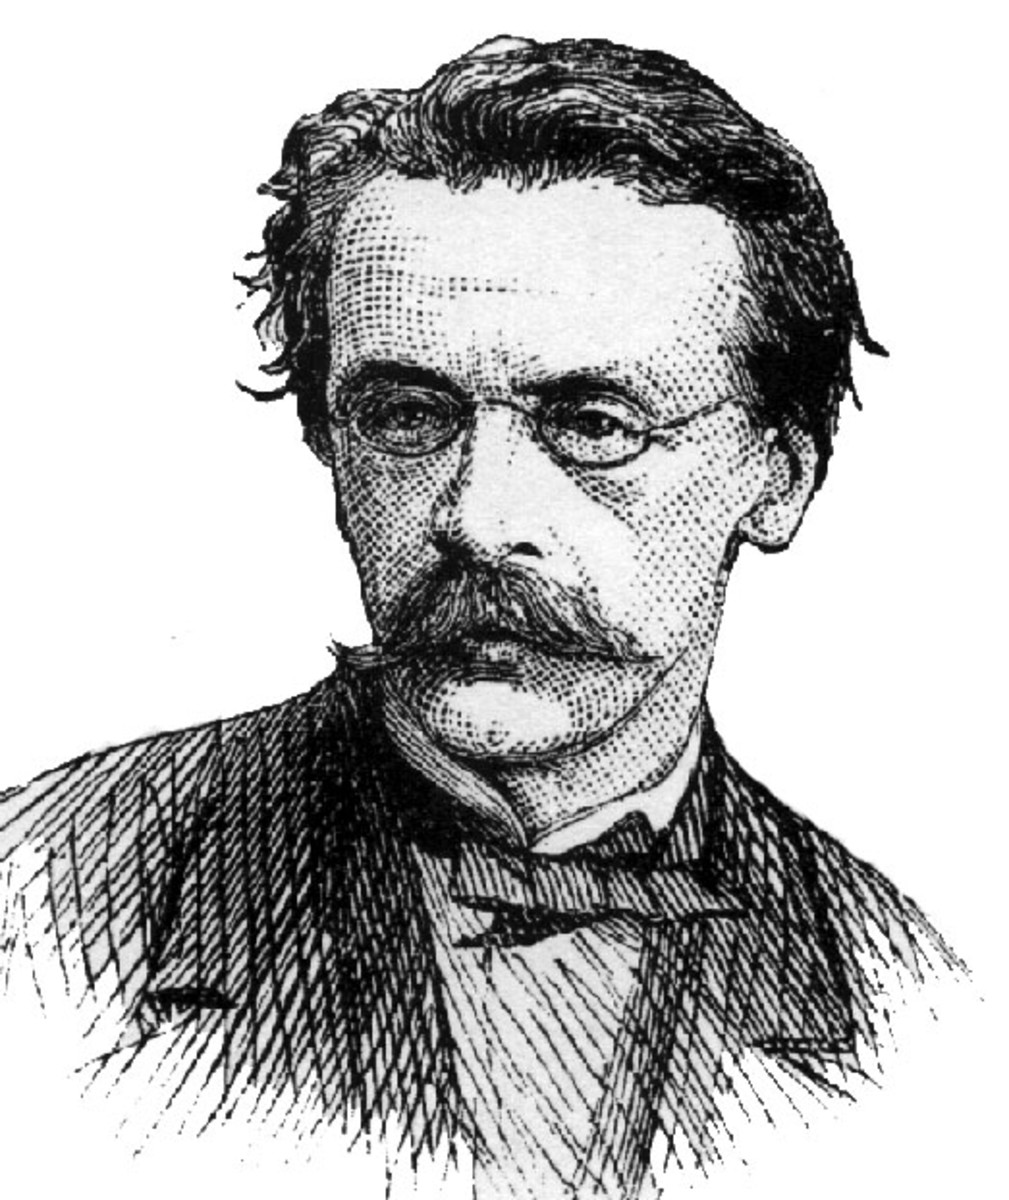 John Louis O'Sullivan (November 15, 1813 – March 24, 1895)